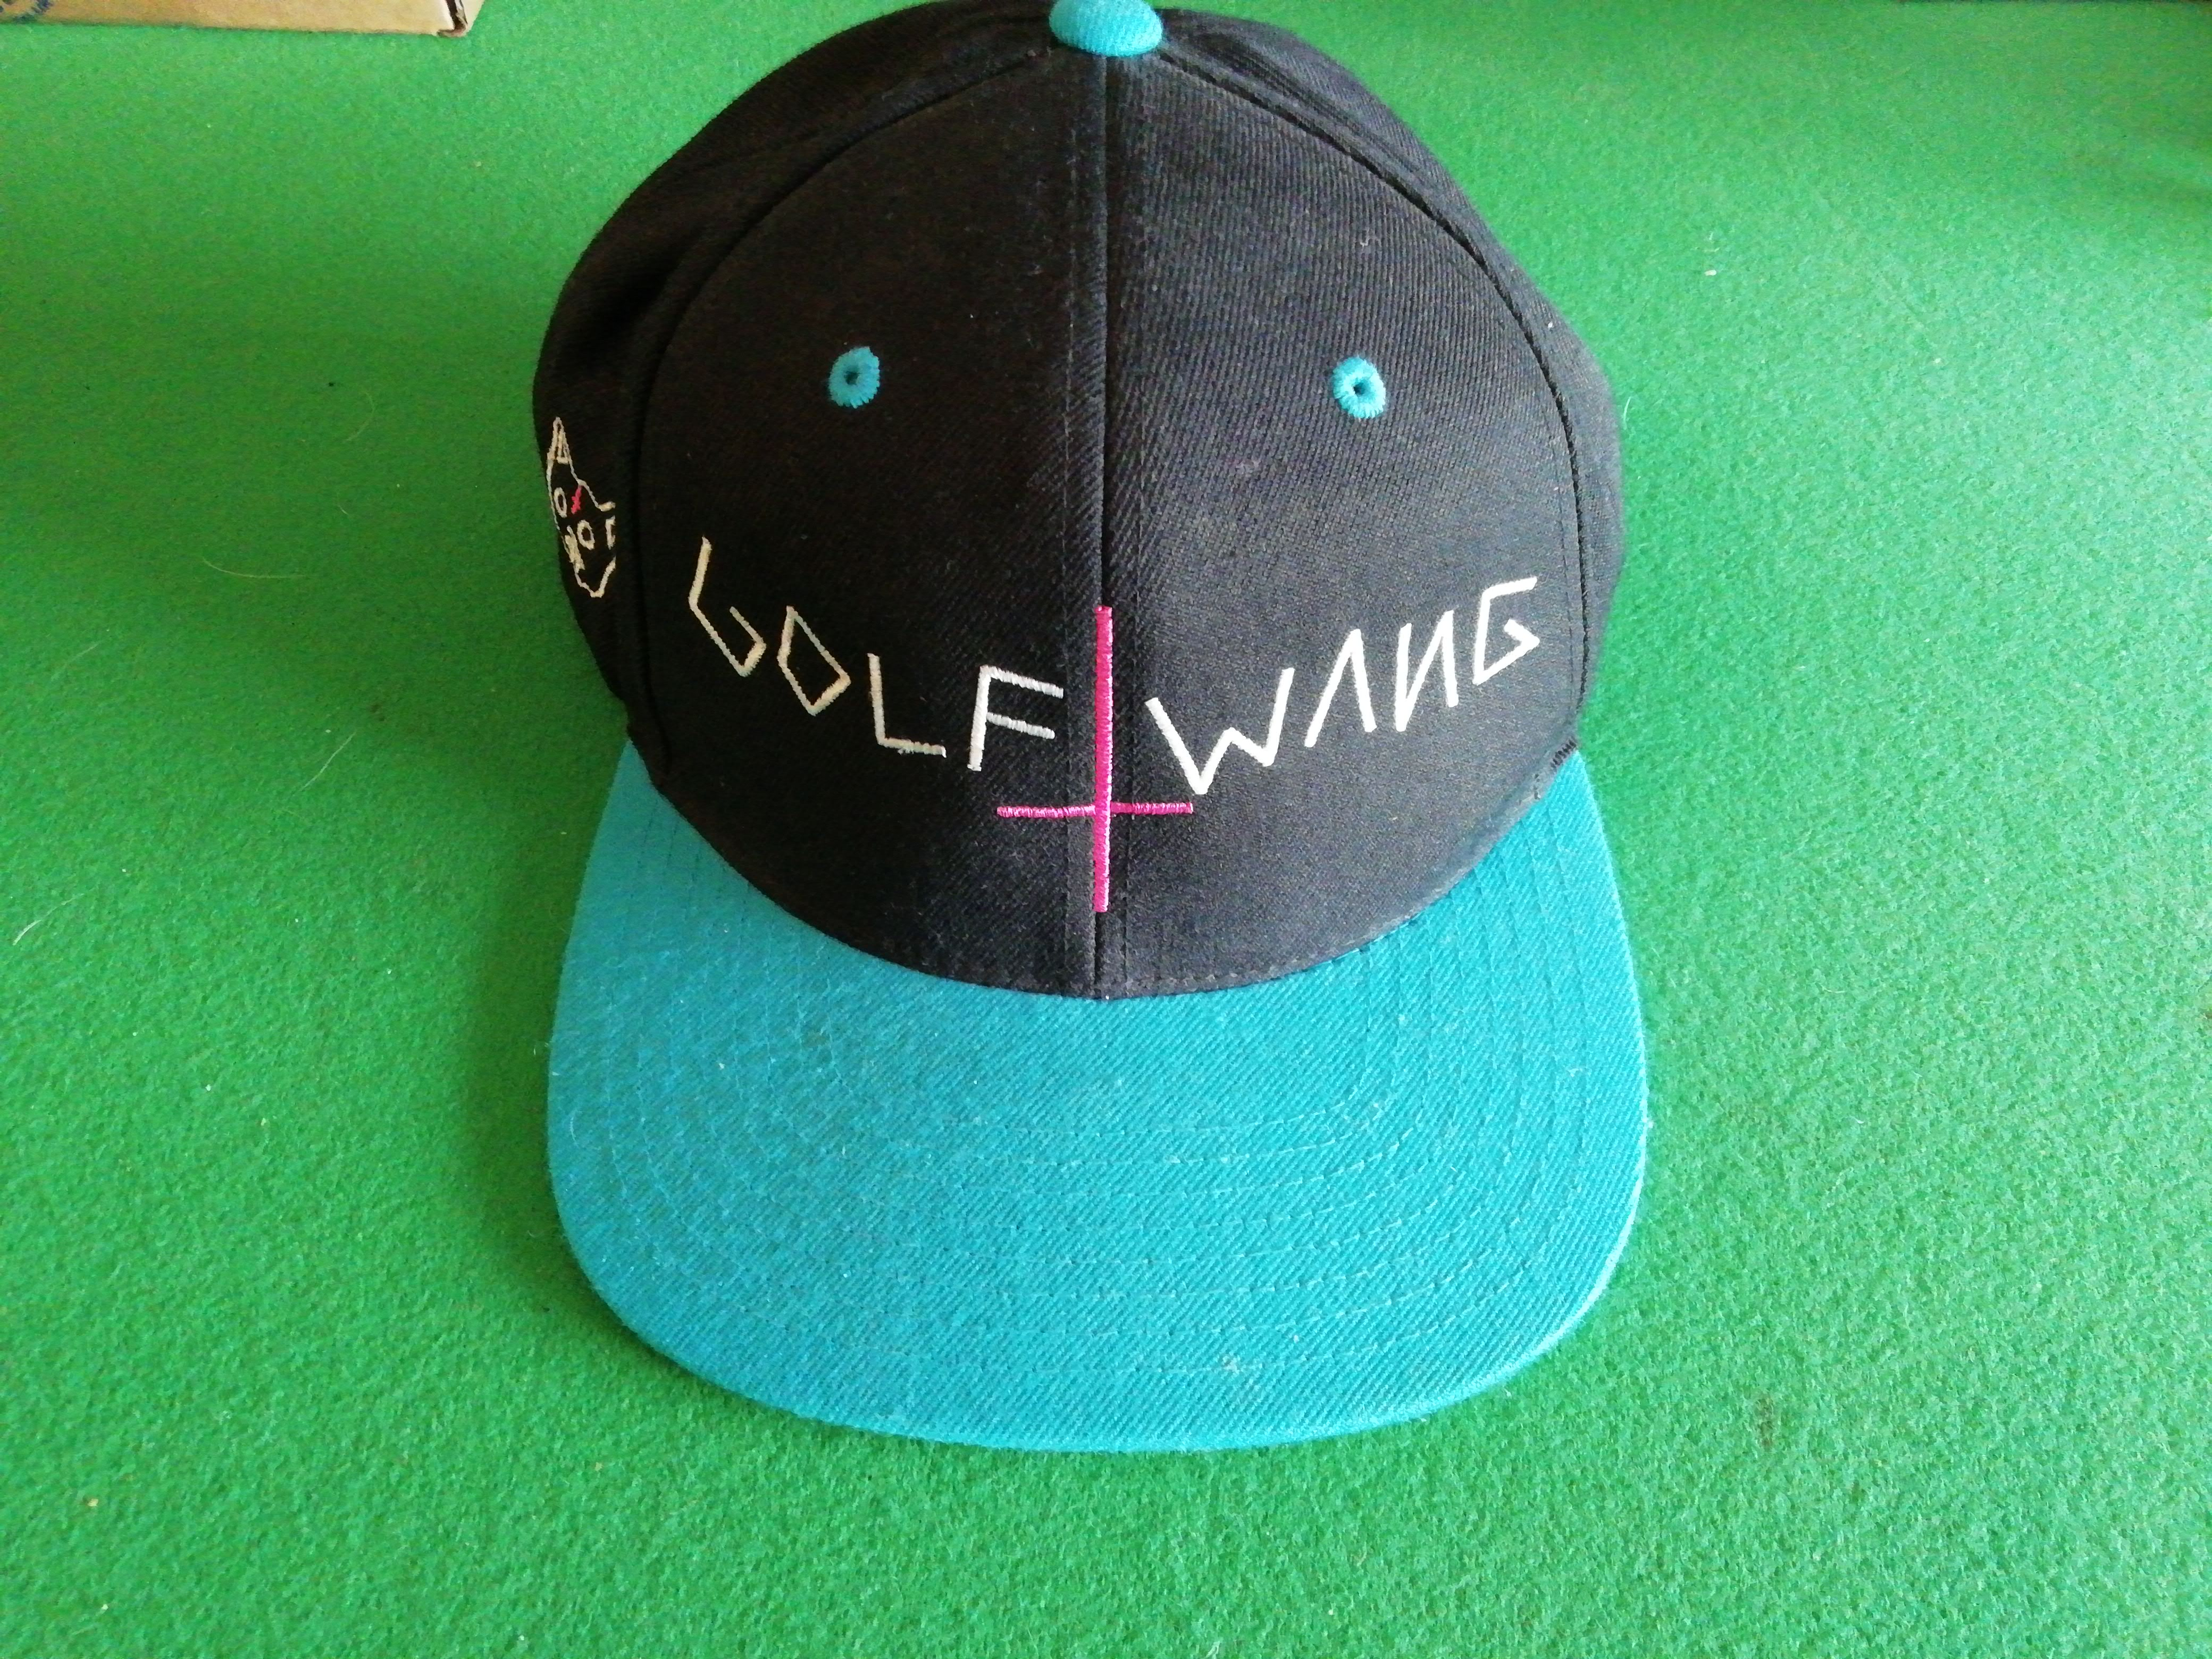 1b398a5b9ceeb Golf Wang ×. Golf Wang Snapback Cap Green Black Blue Cross Hat Odd ...